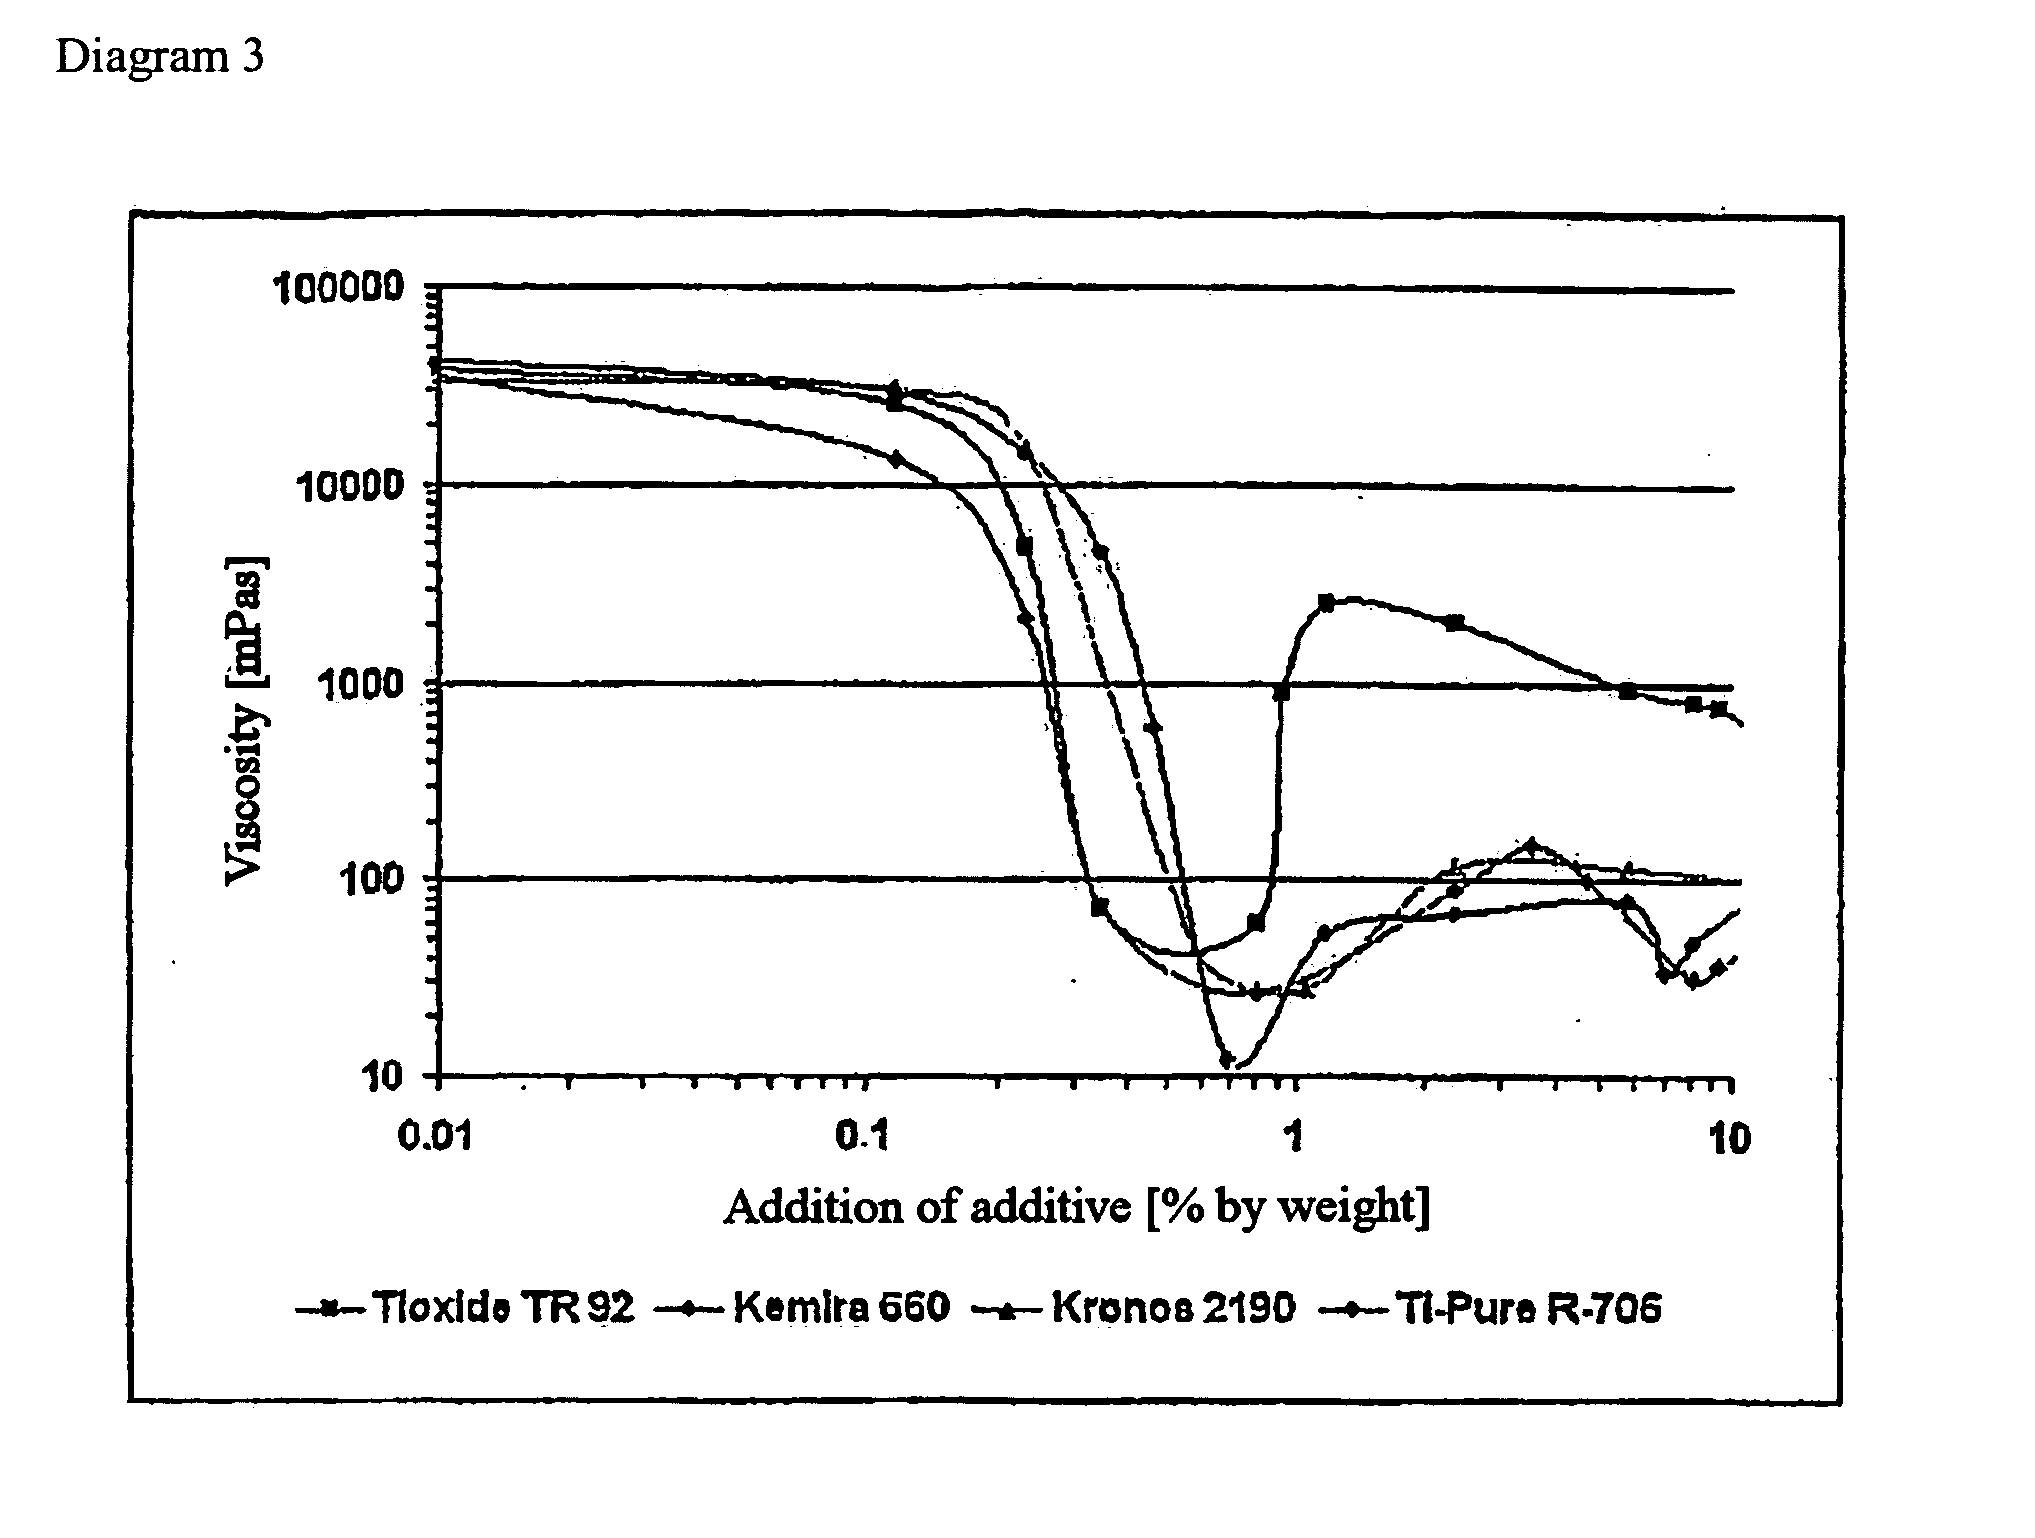 Viscosity Diagram Diagram 4 shows the